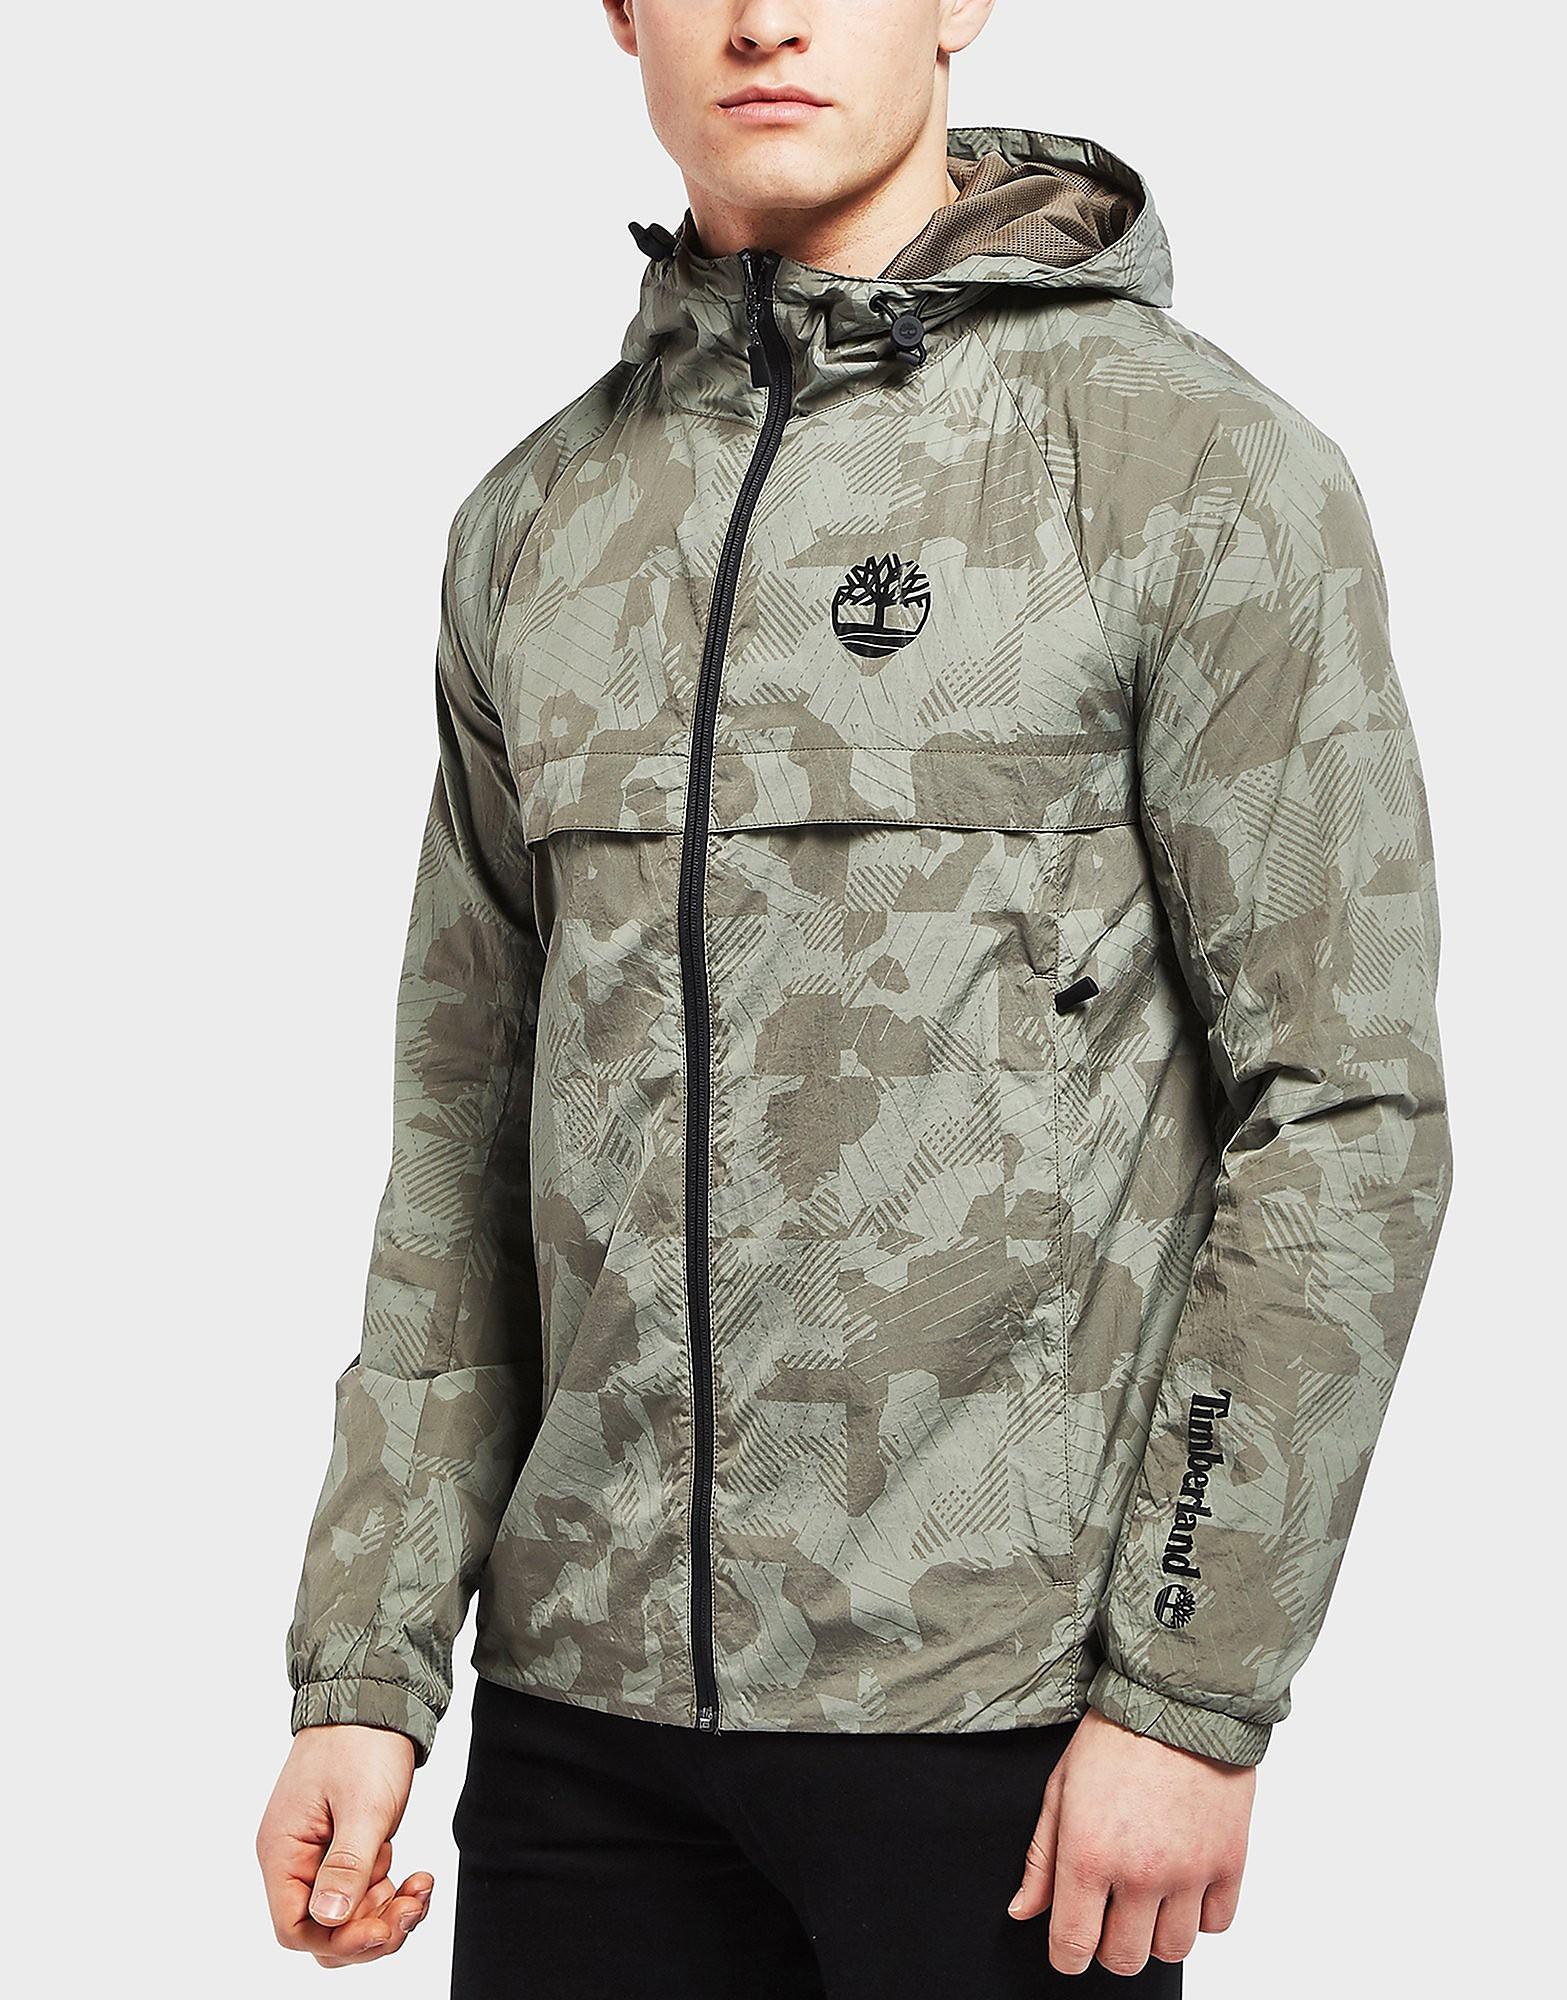 Timberland Full Zip Lightweight Windbreaker Jacket